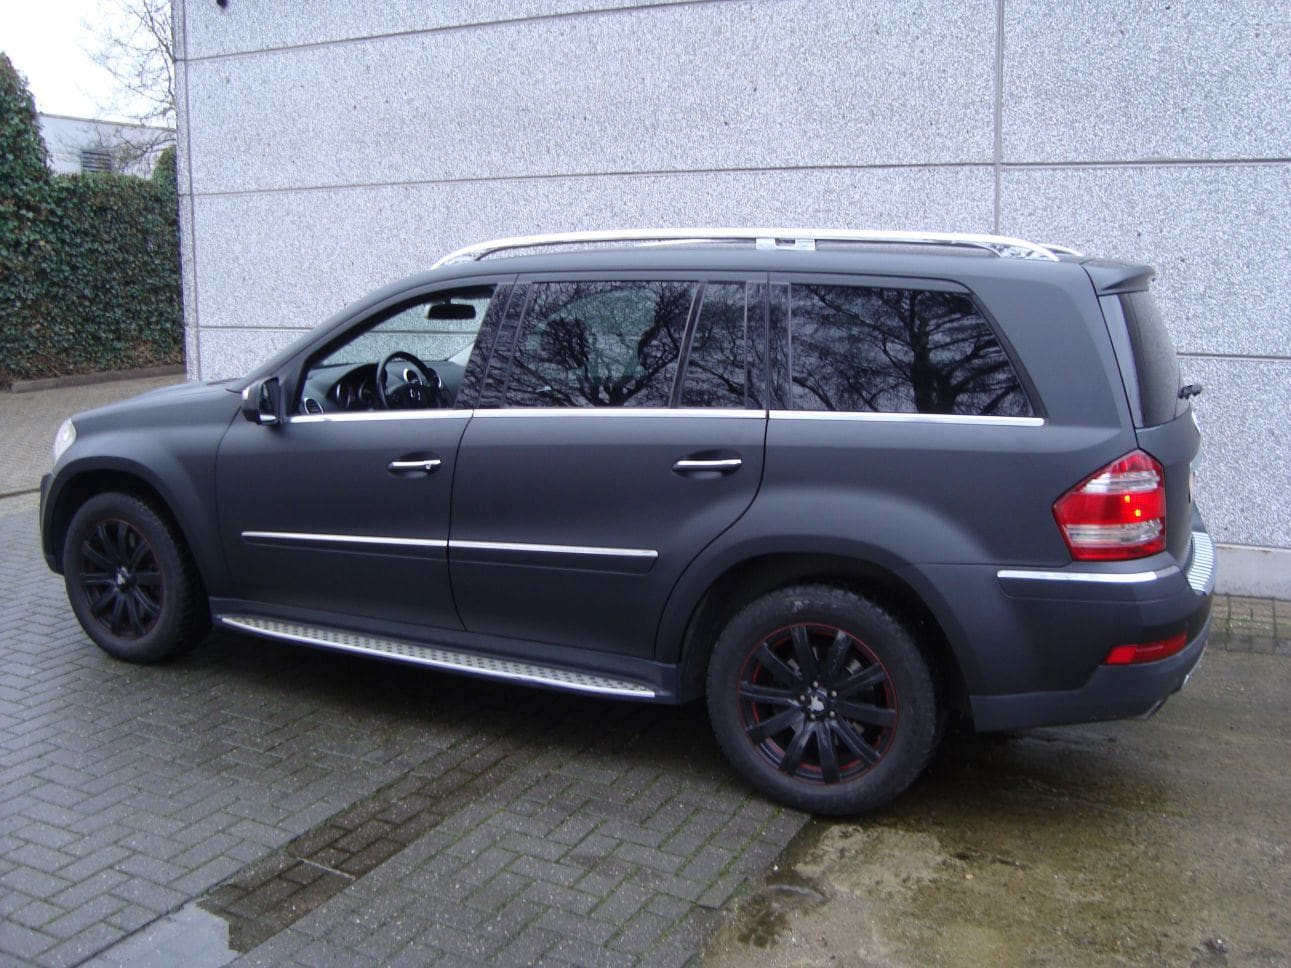 Mercedes GL met Mat Zwarte Wrap, Carwrapping door Wrapmyride.nu Foto-nr:6281, ©2021